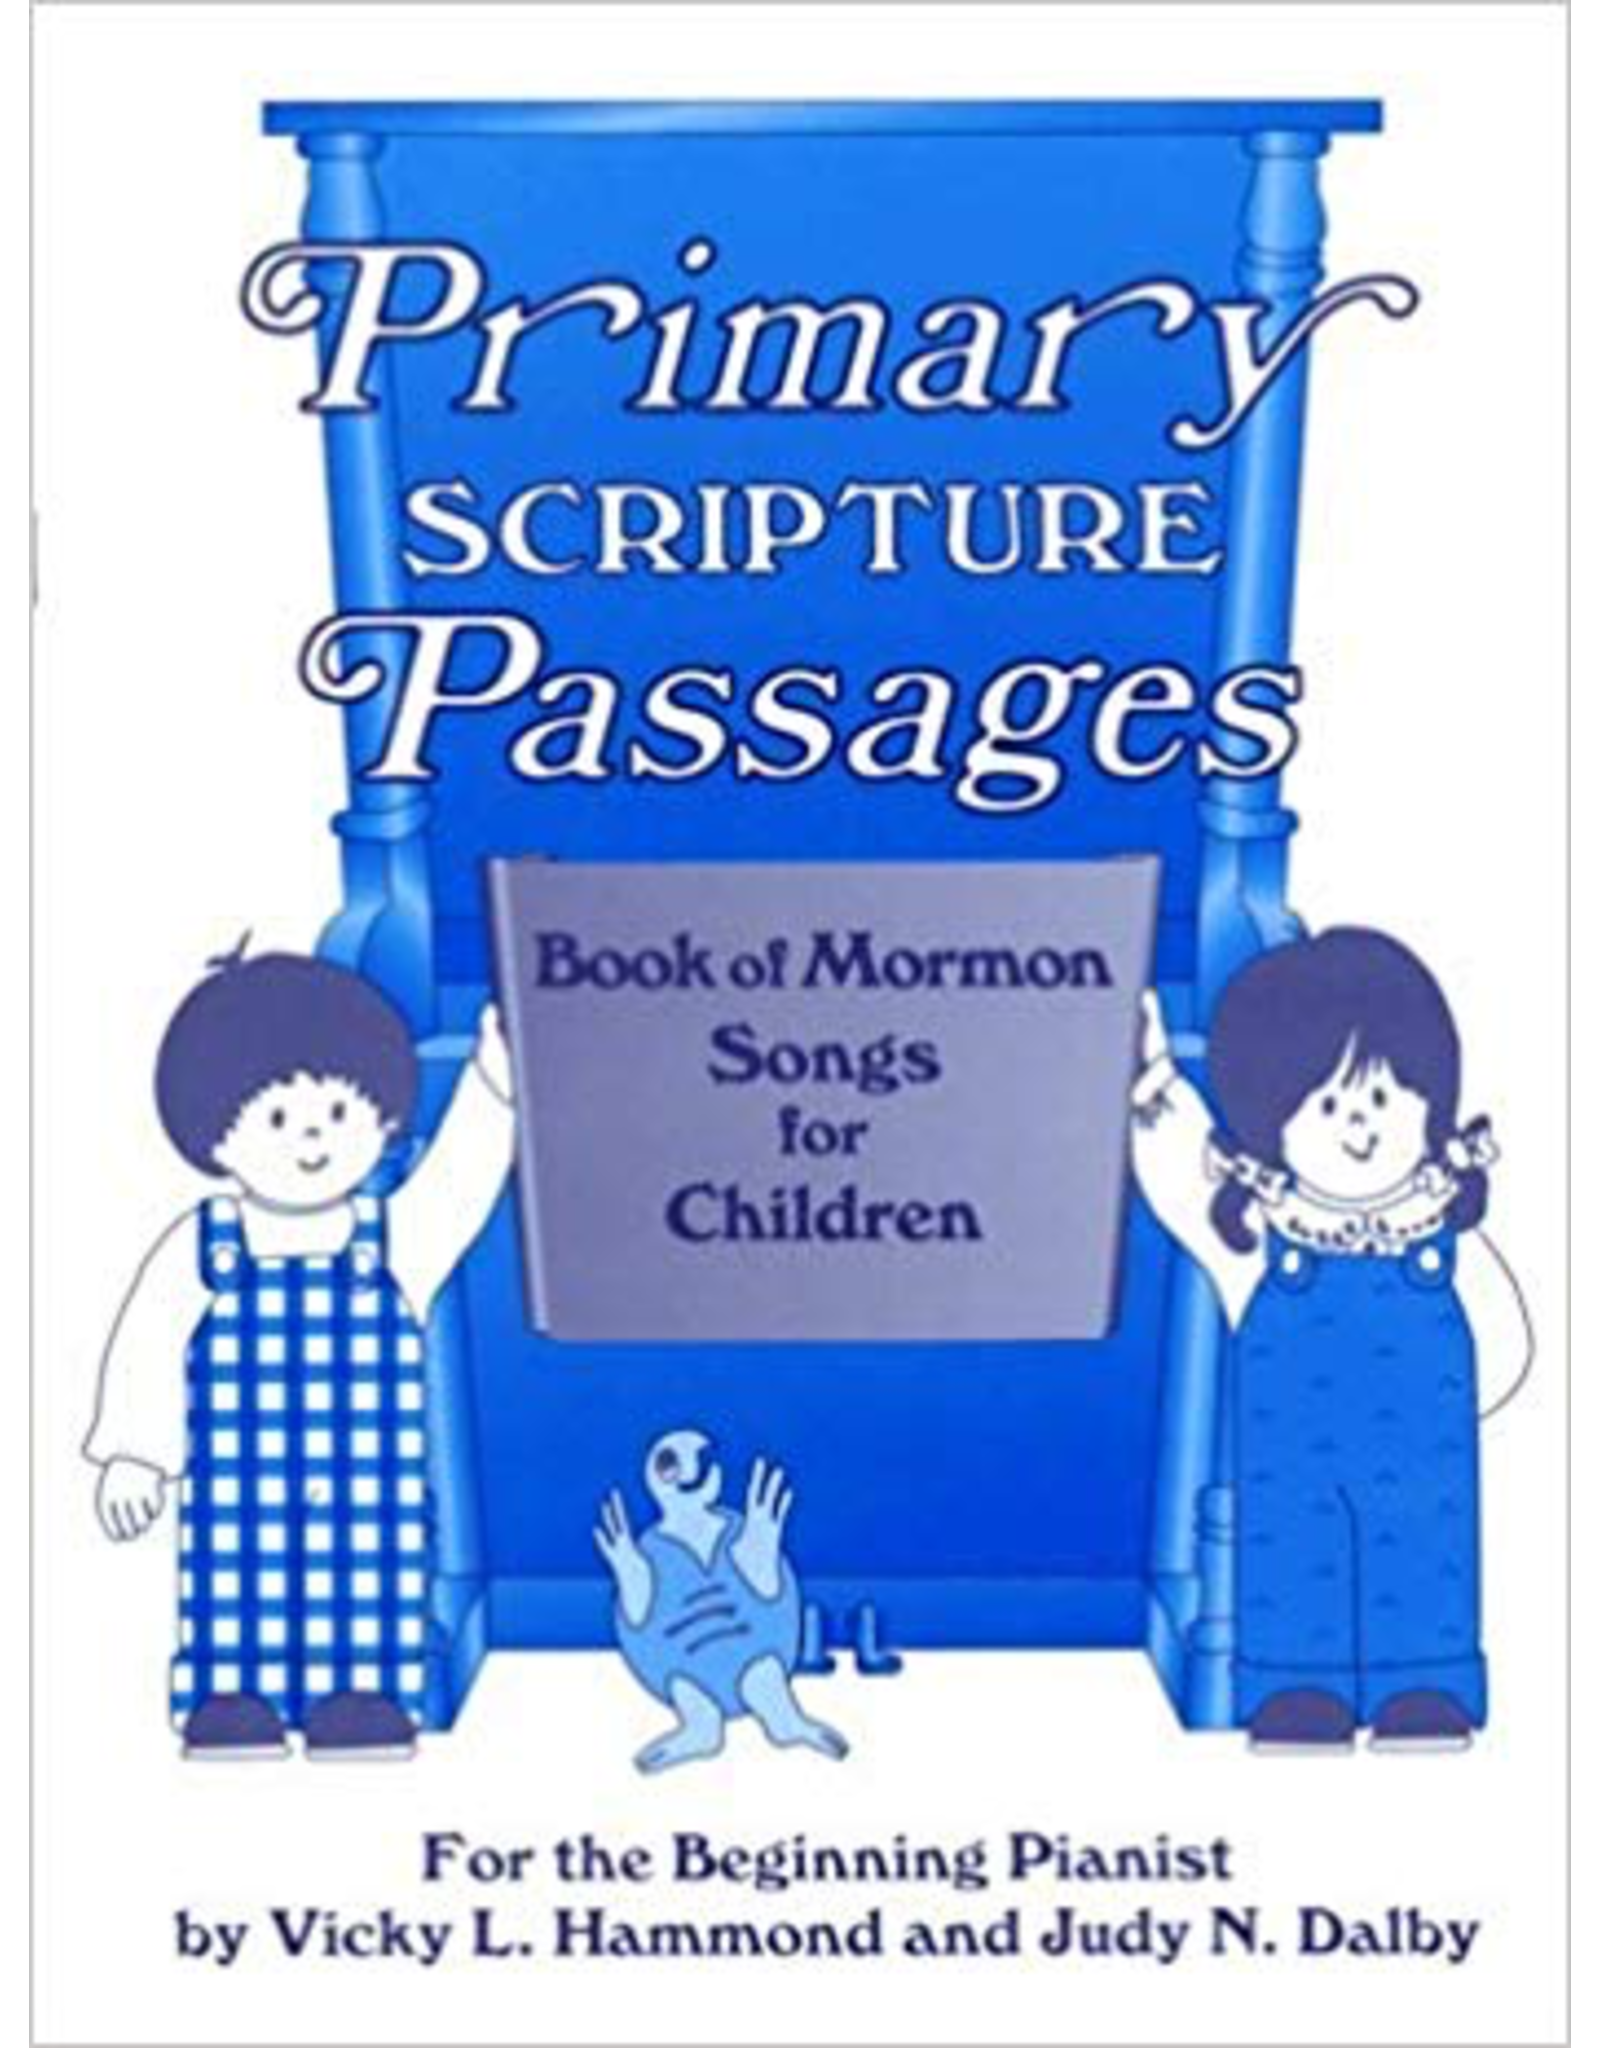 Primary Passages Primary Scripture Passages